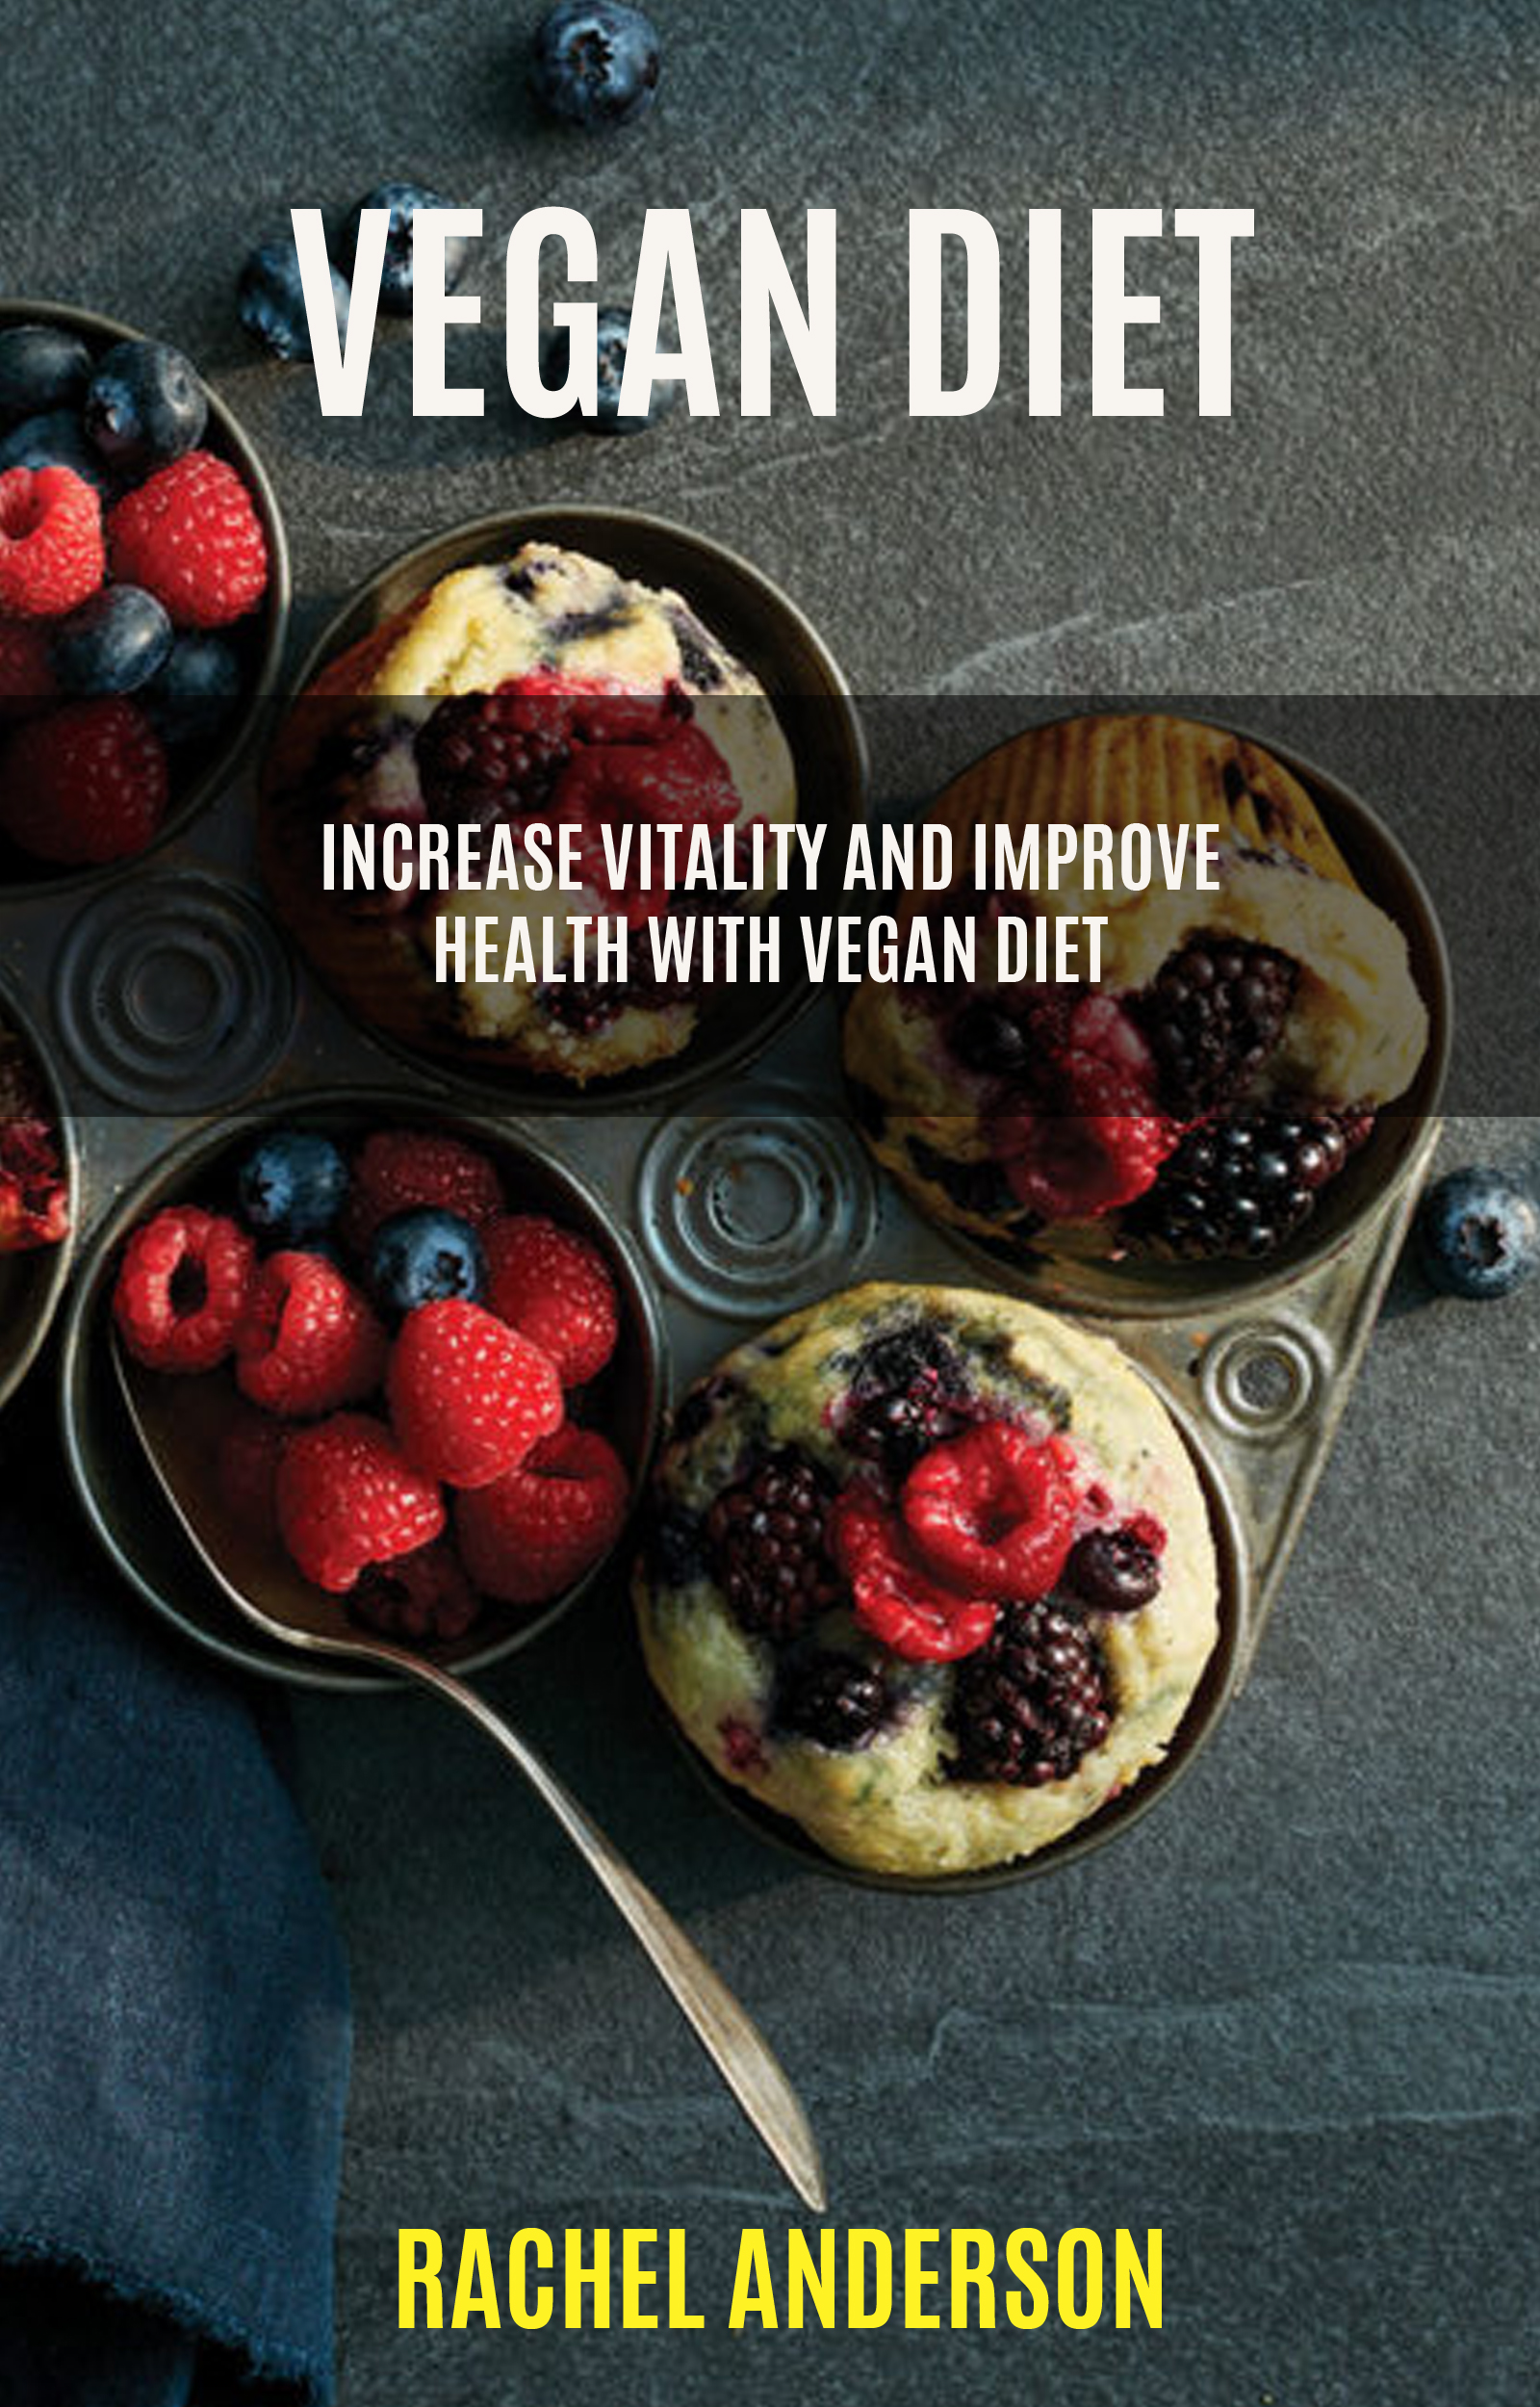 Vegan diet: increase vitality and improve health with vegan diet